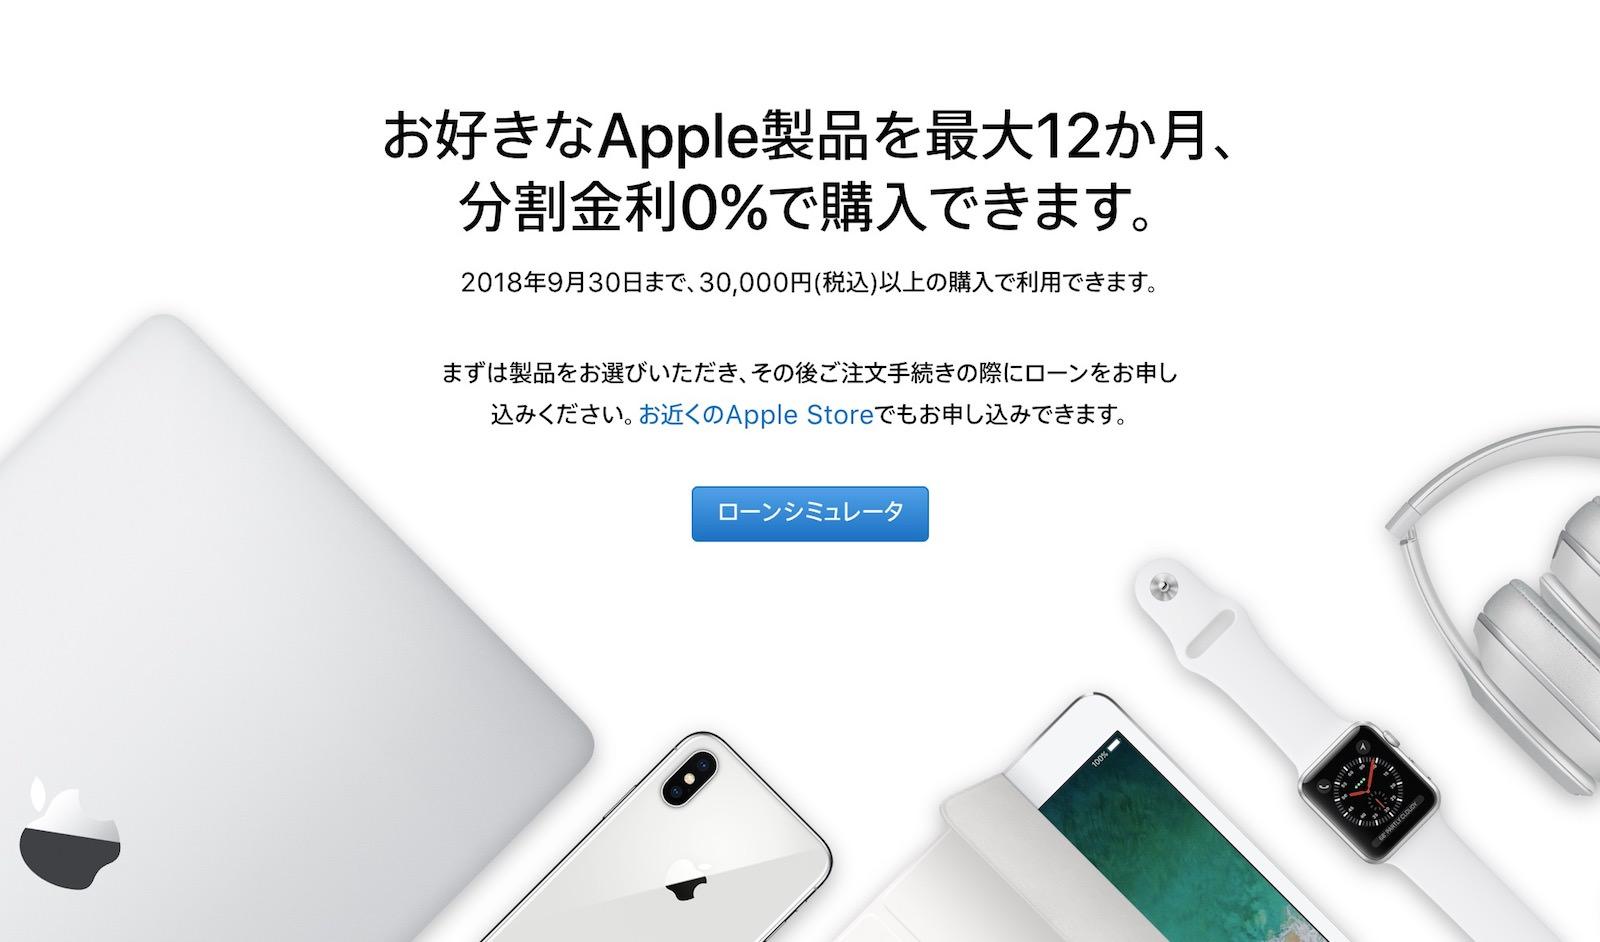 Apple Financing 201809